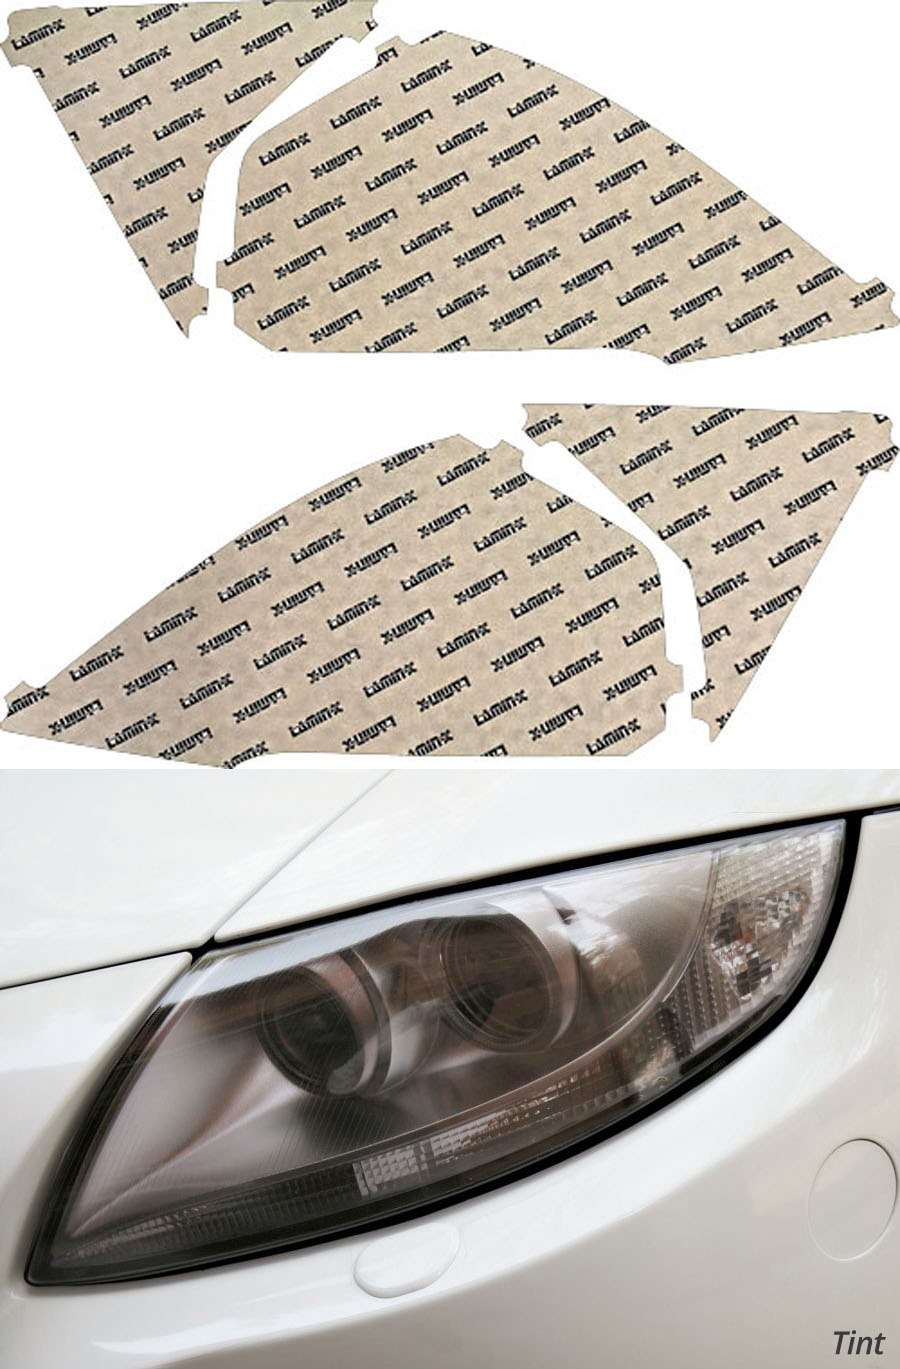 Honda CR-V 10-11 Tint Headlight Covers Lamin-X H038T